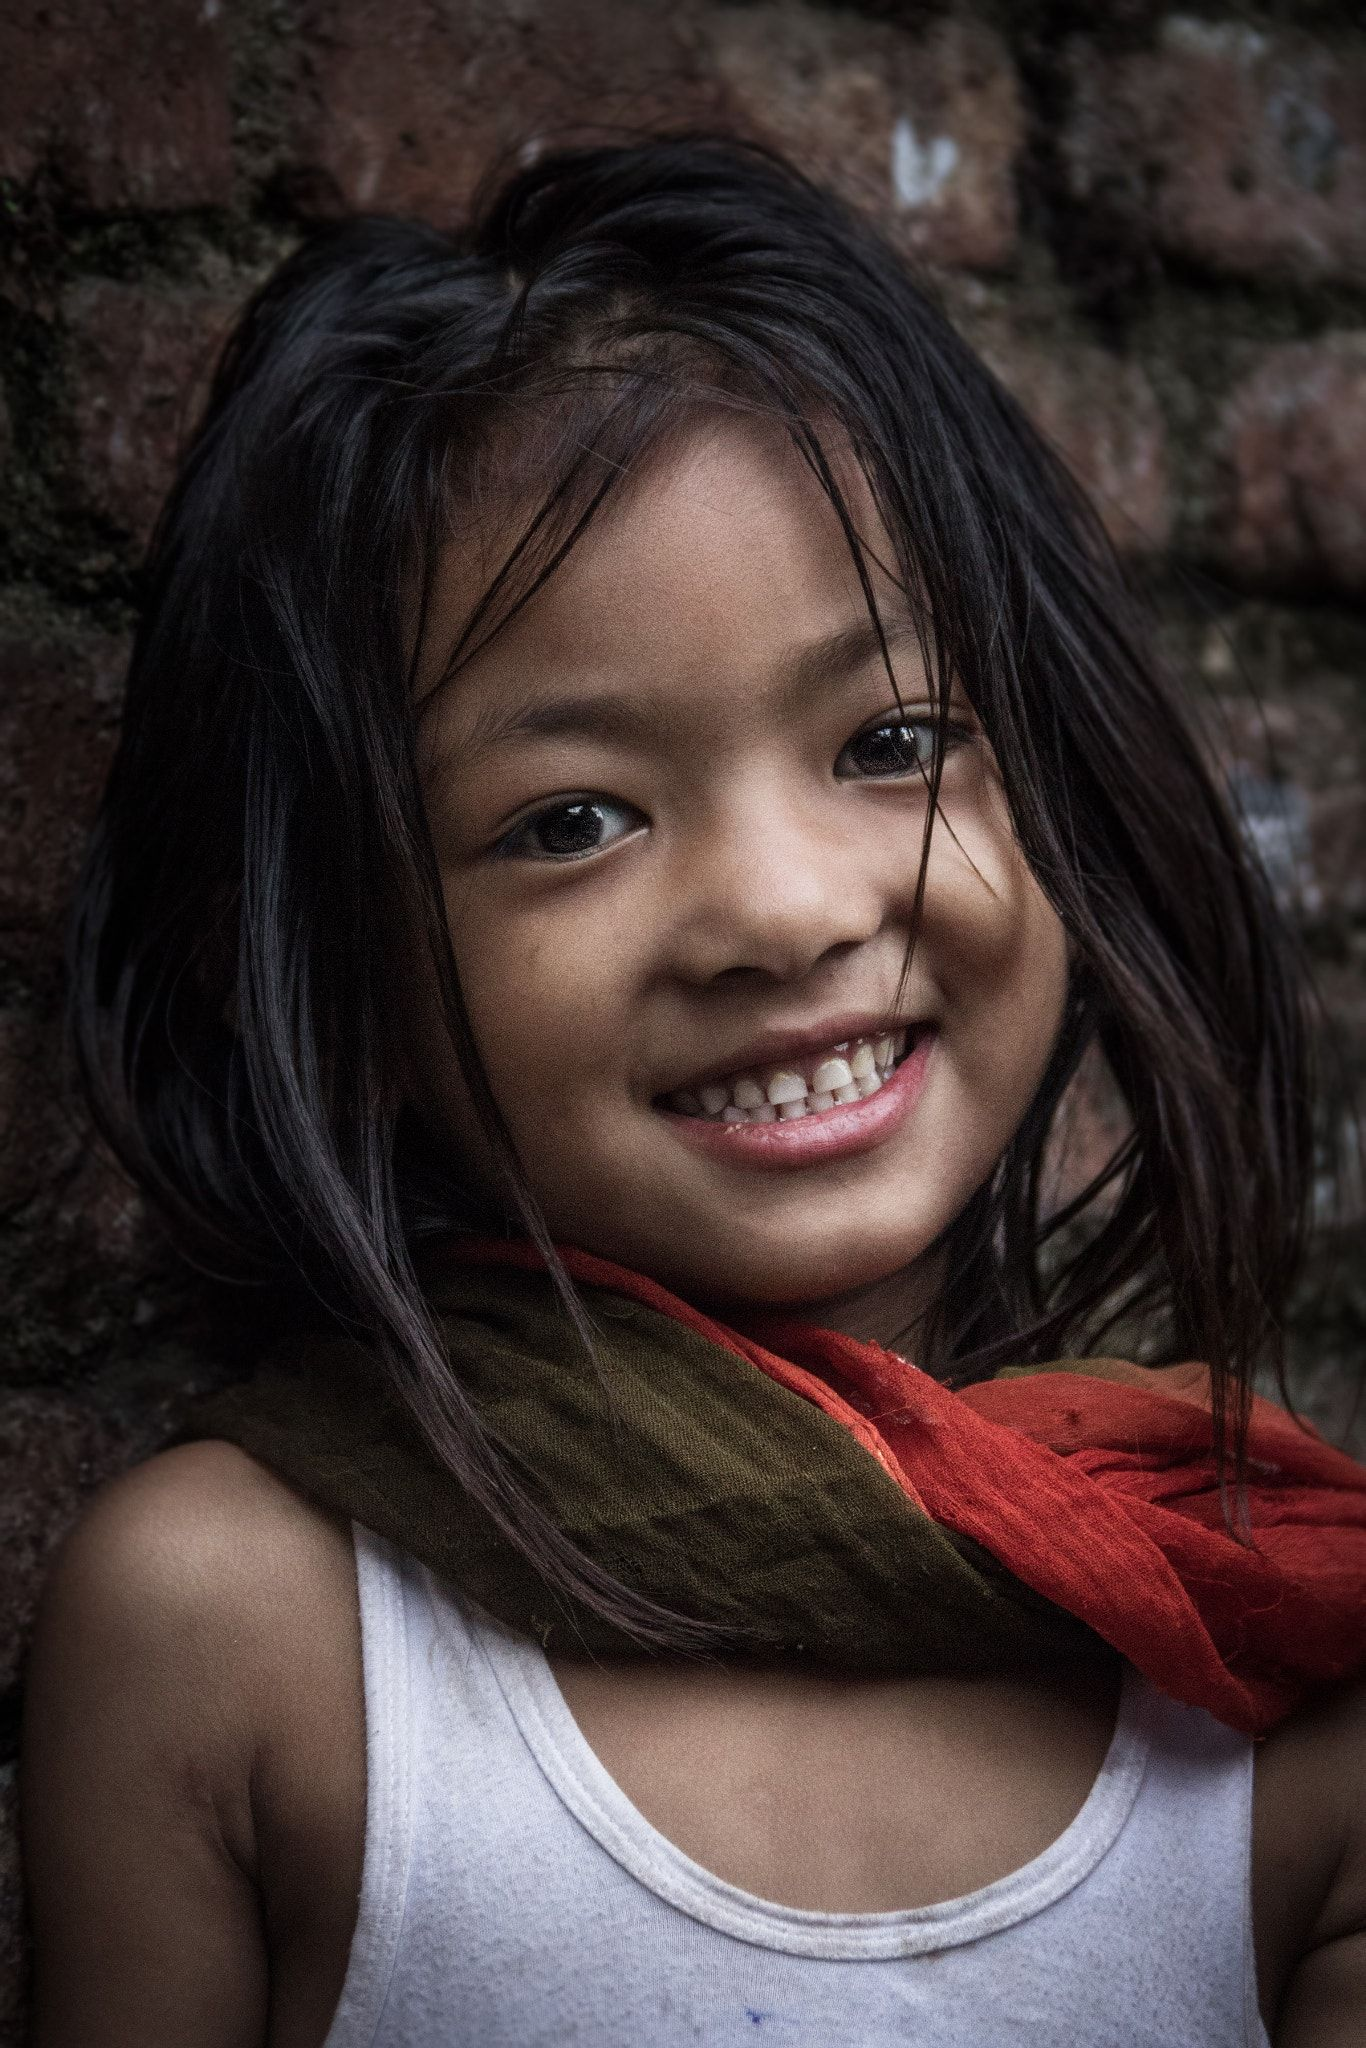 Smile - ...